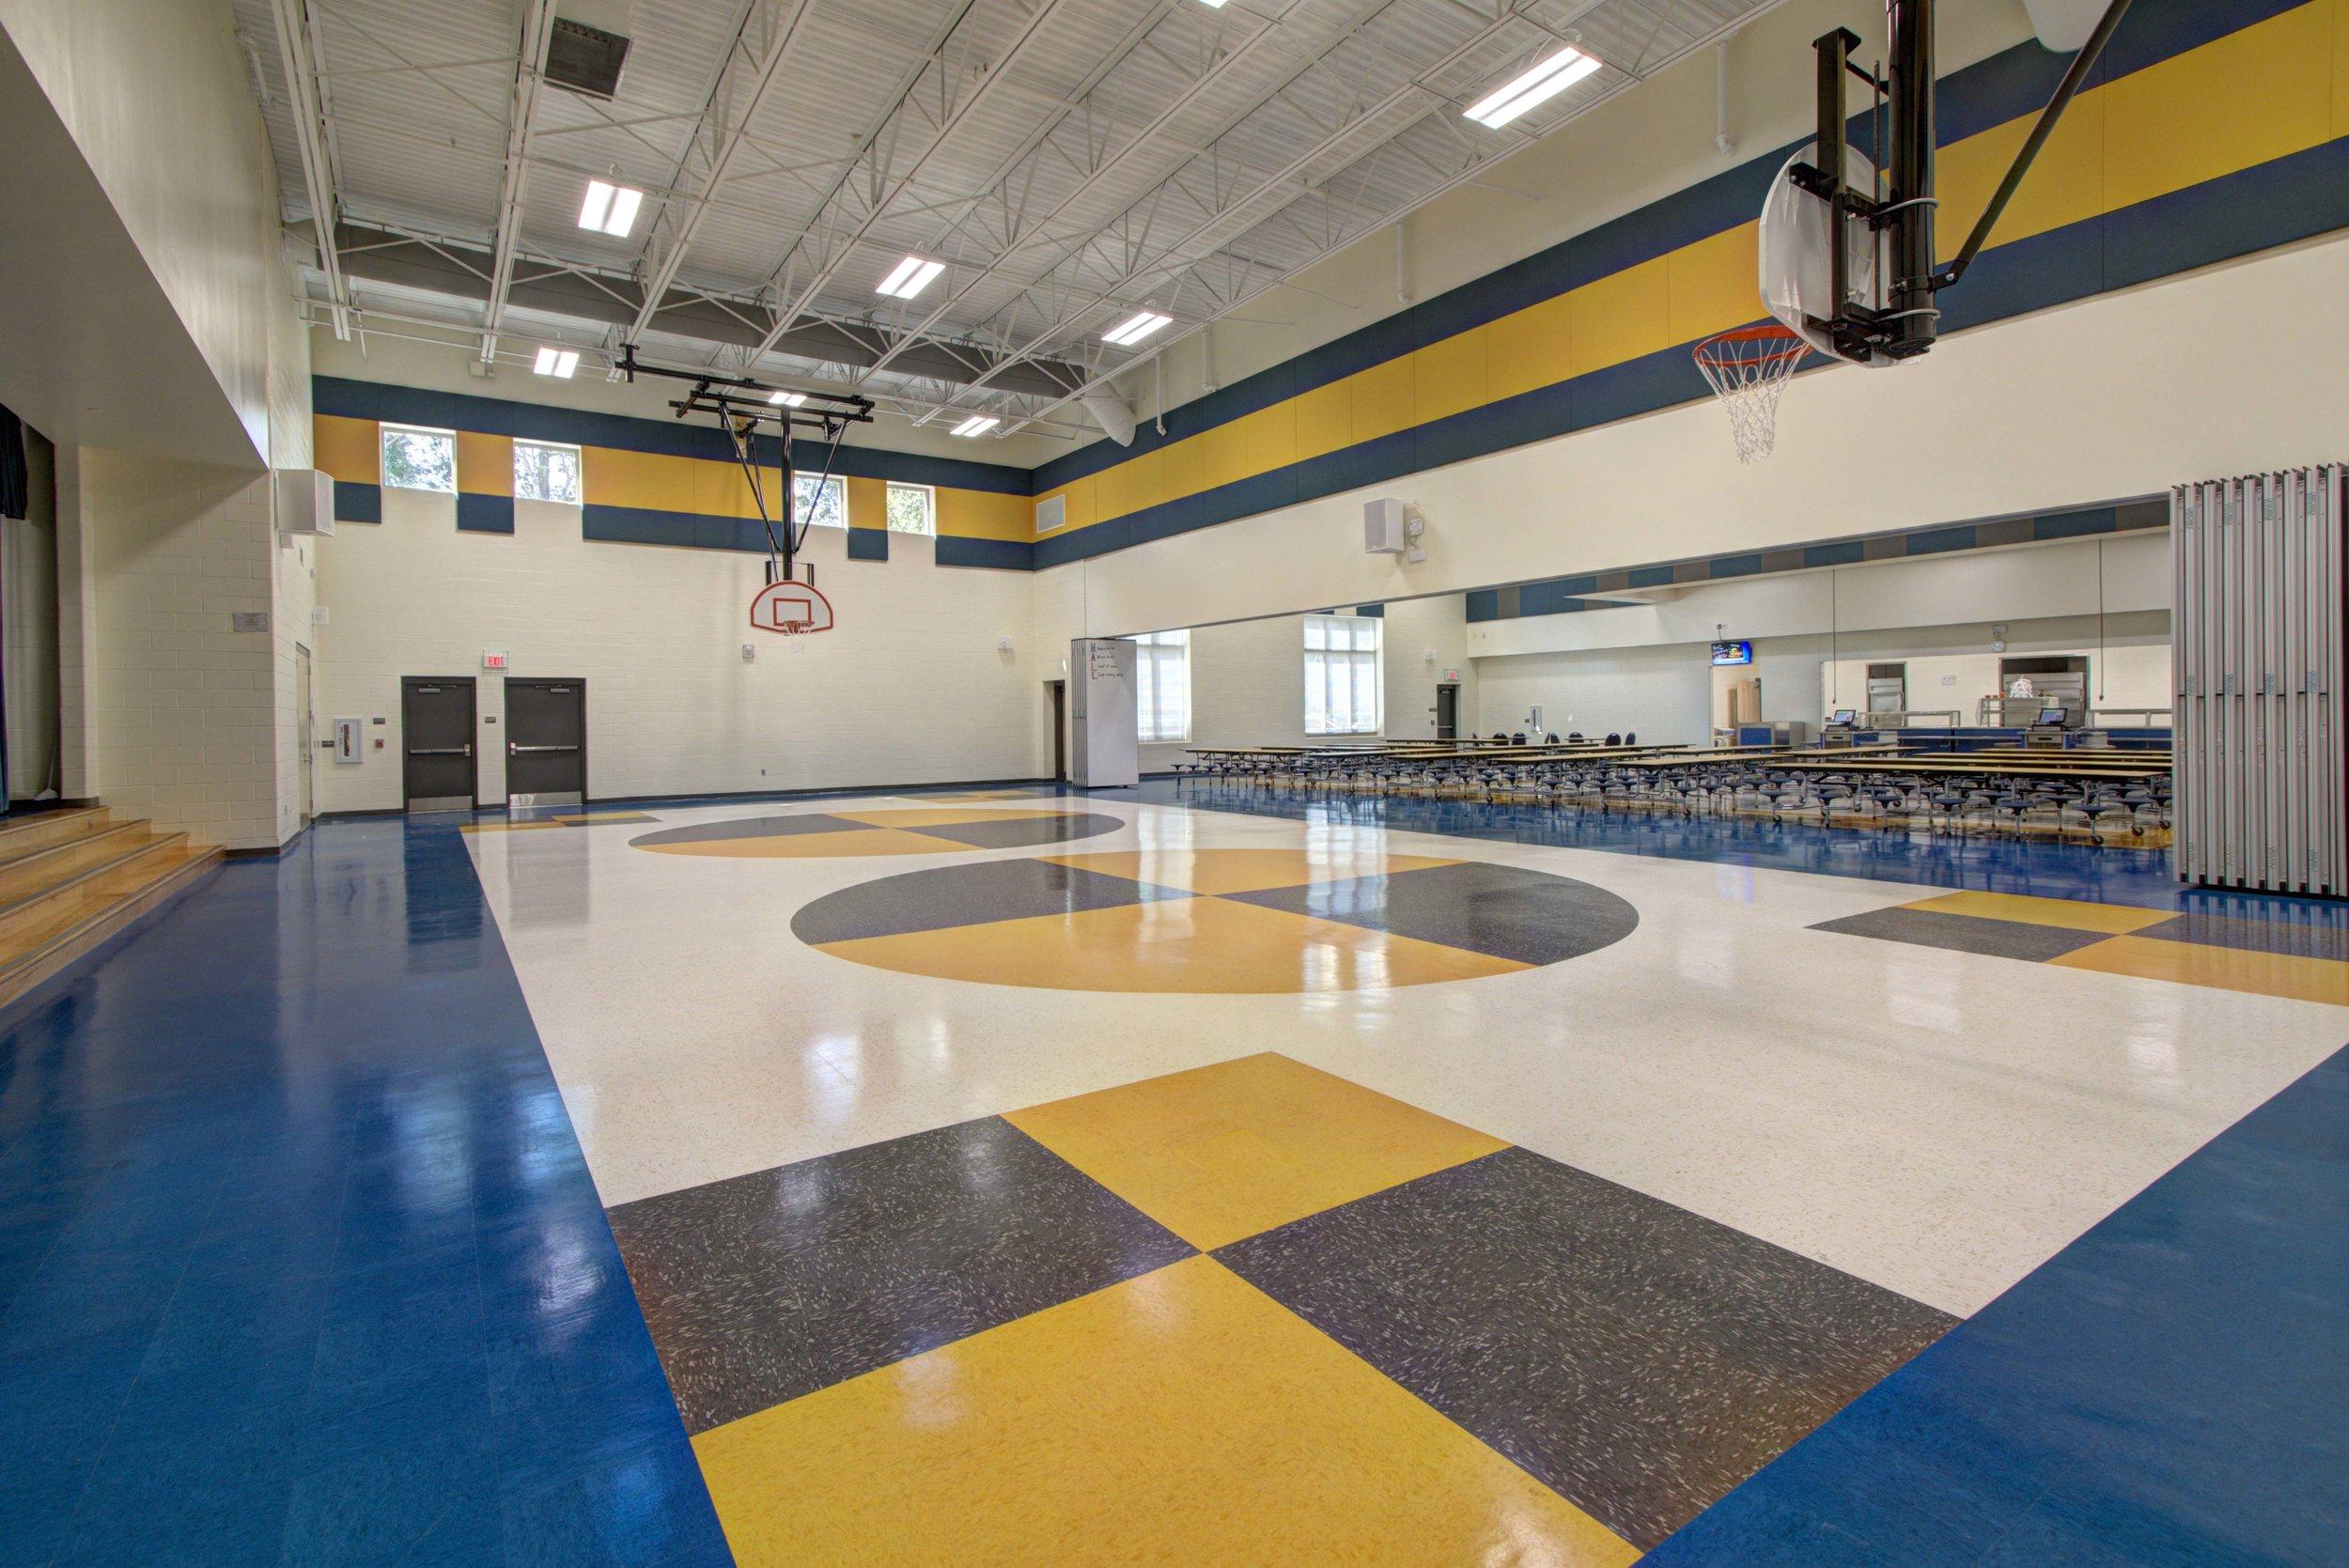 ADW-K-12-Education-Statesville-Road-Elementary-School-Charlotte-NC-Gymnasium.JPG